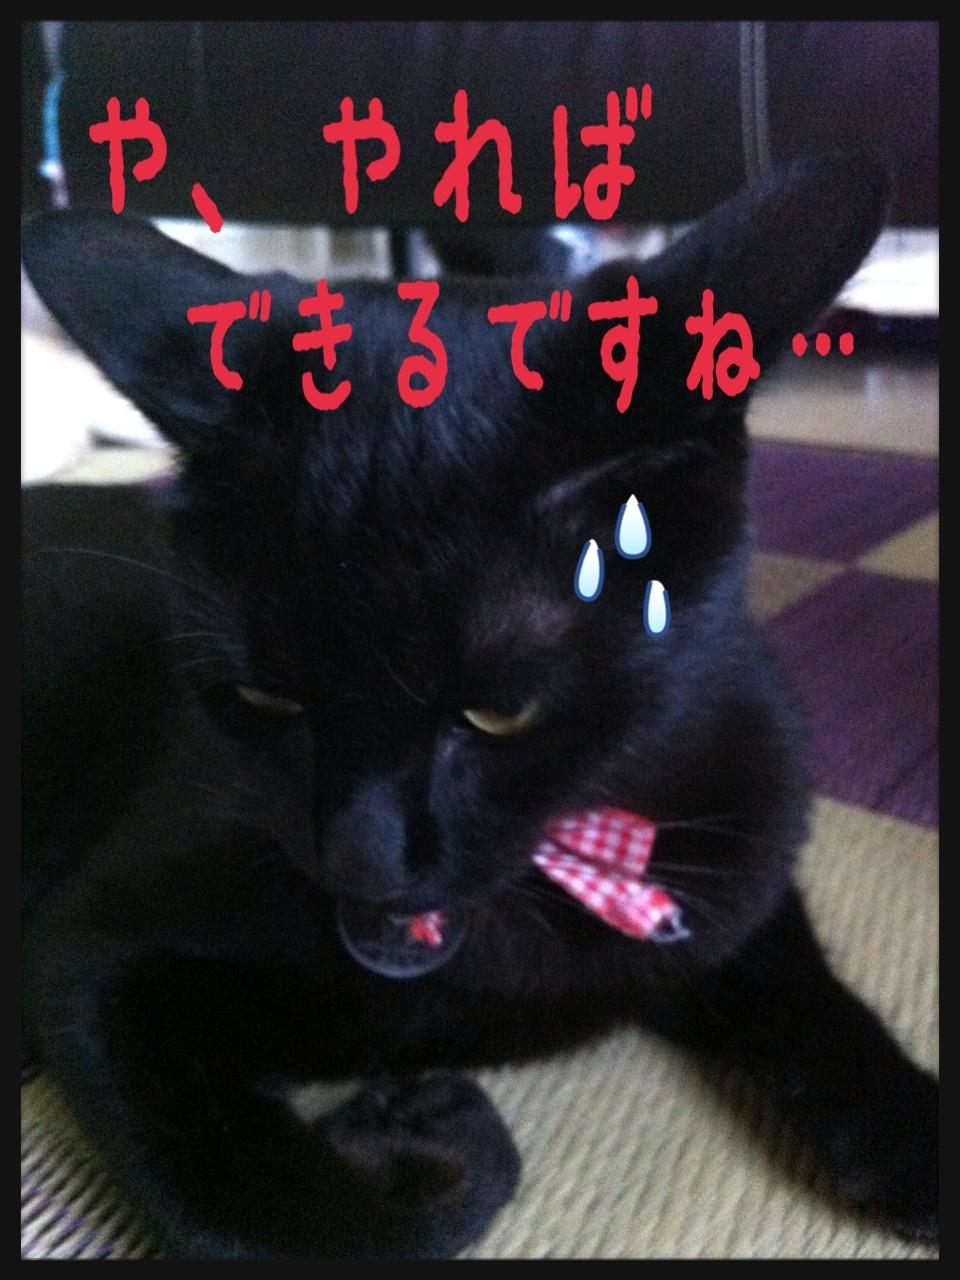 image_20130704195007.jpg